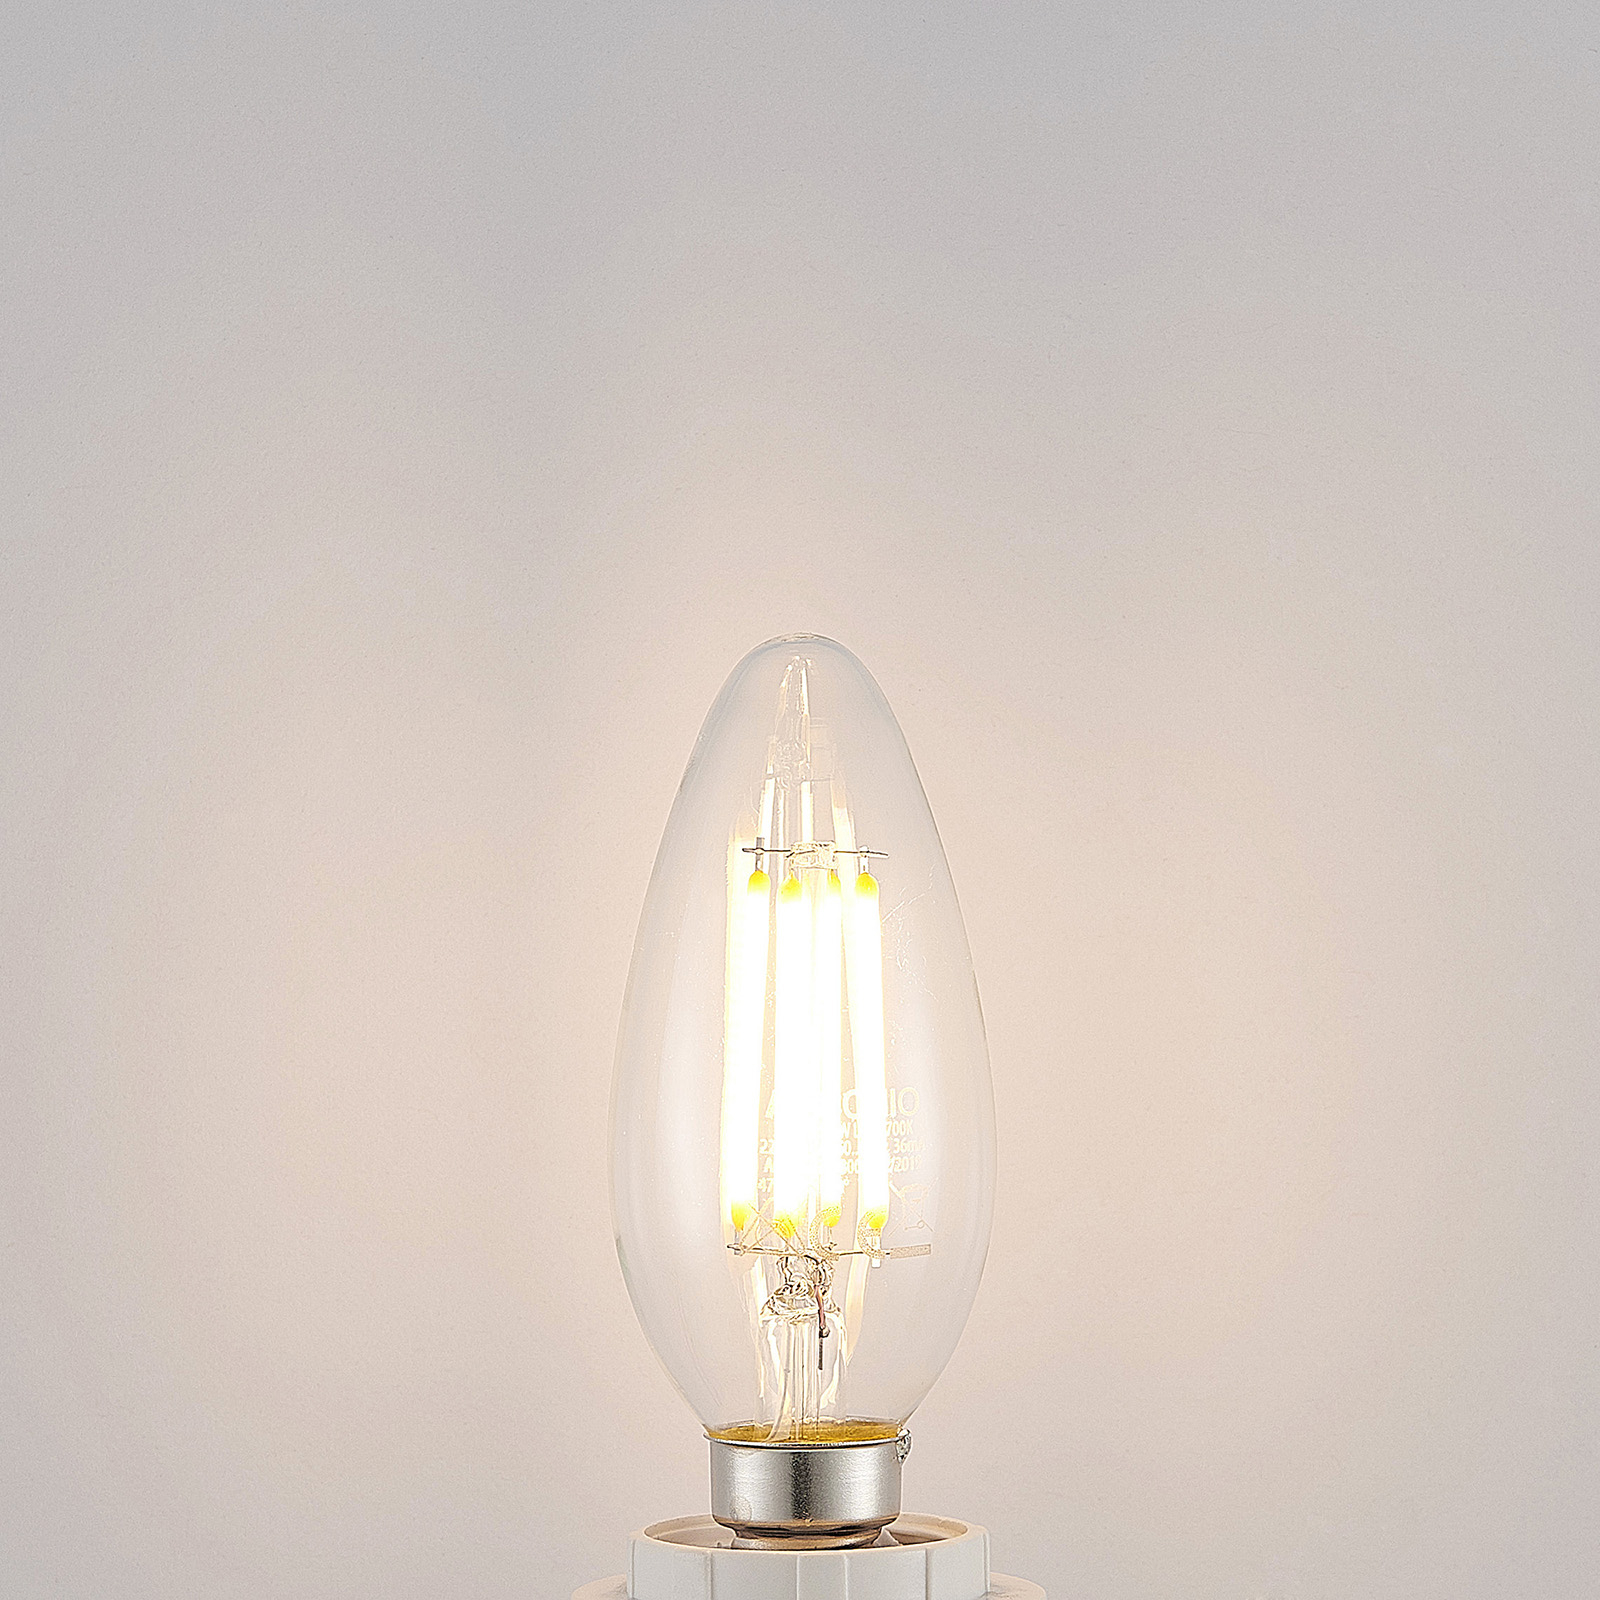 LED-pære E14 filament 4W 2 700K 3-step-dimmer